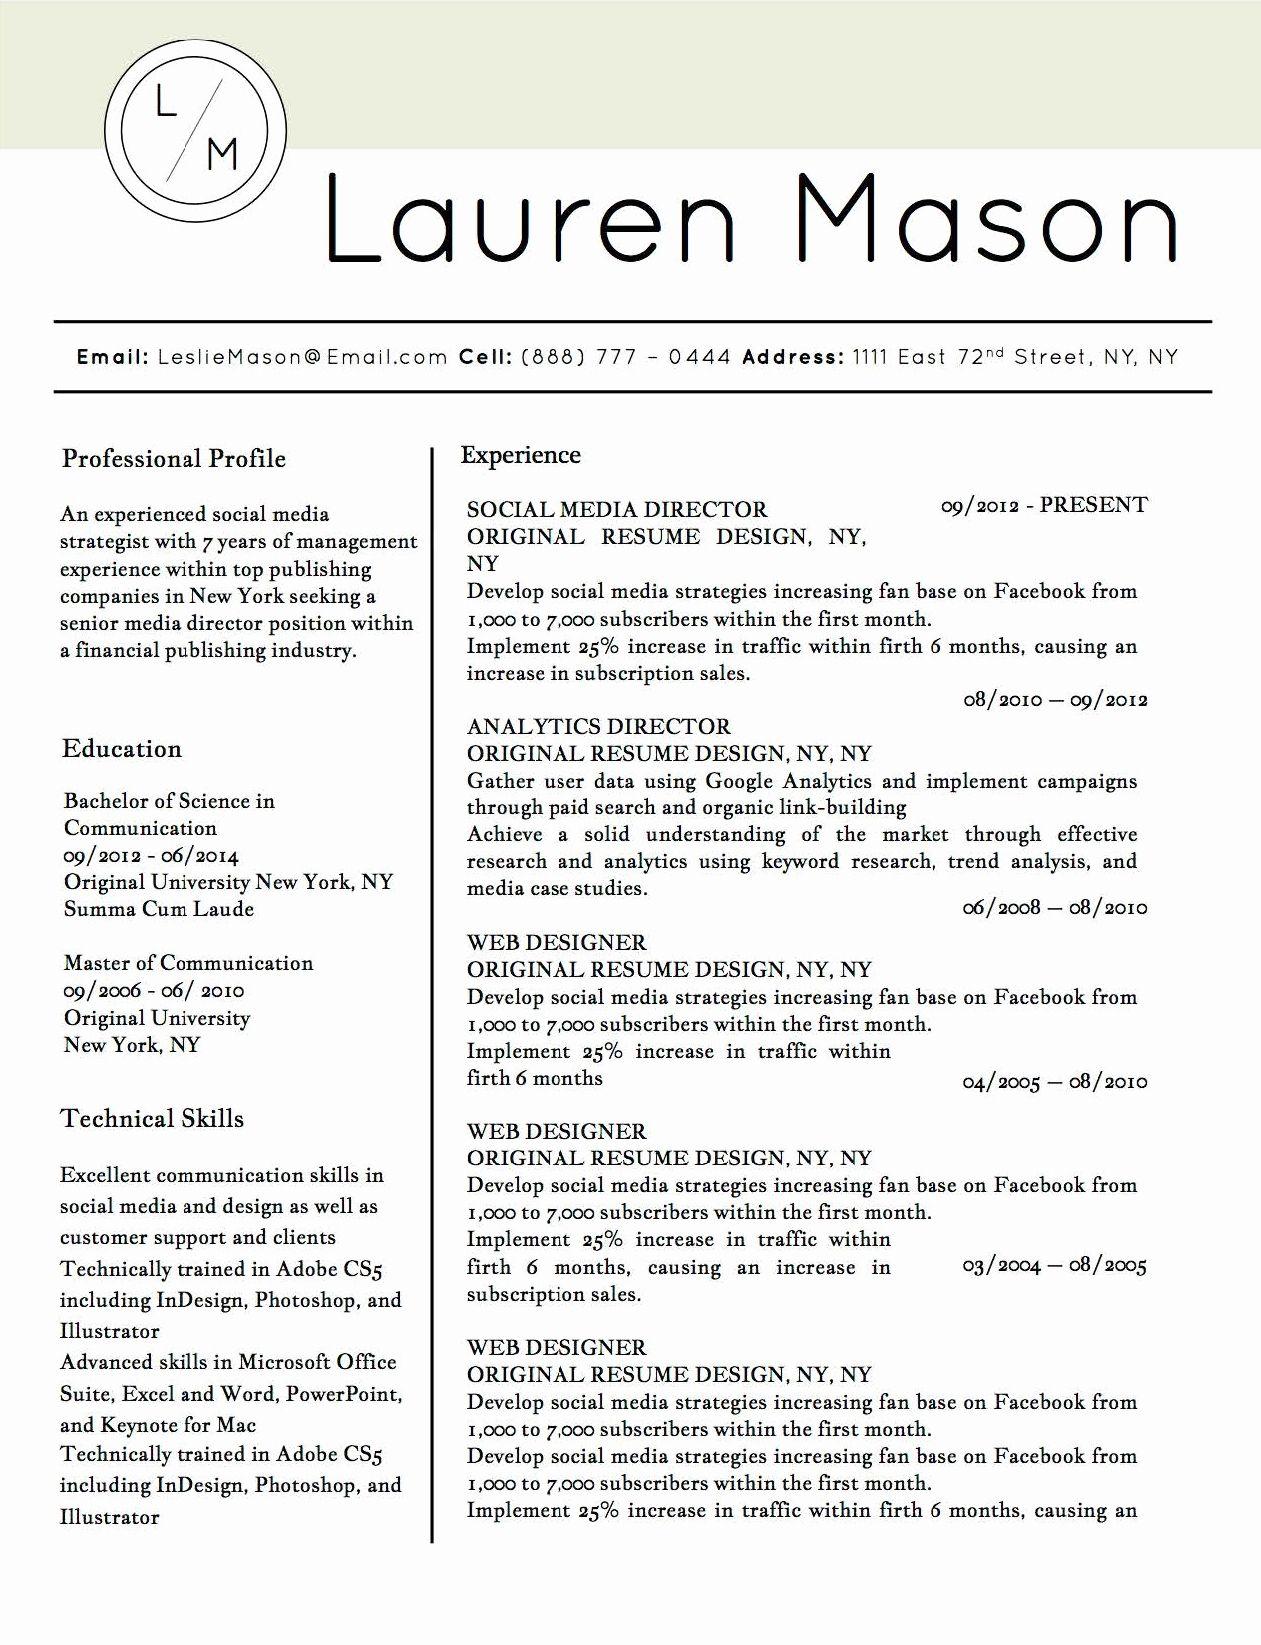 25 Microsoft Word Template Resume in 2020 Job resume